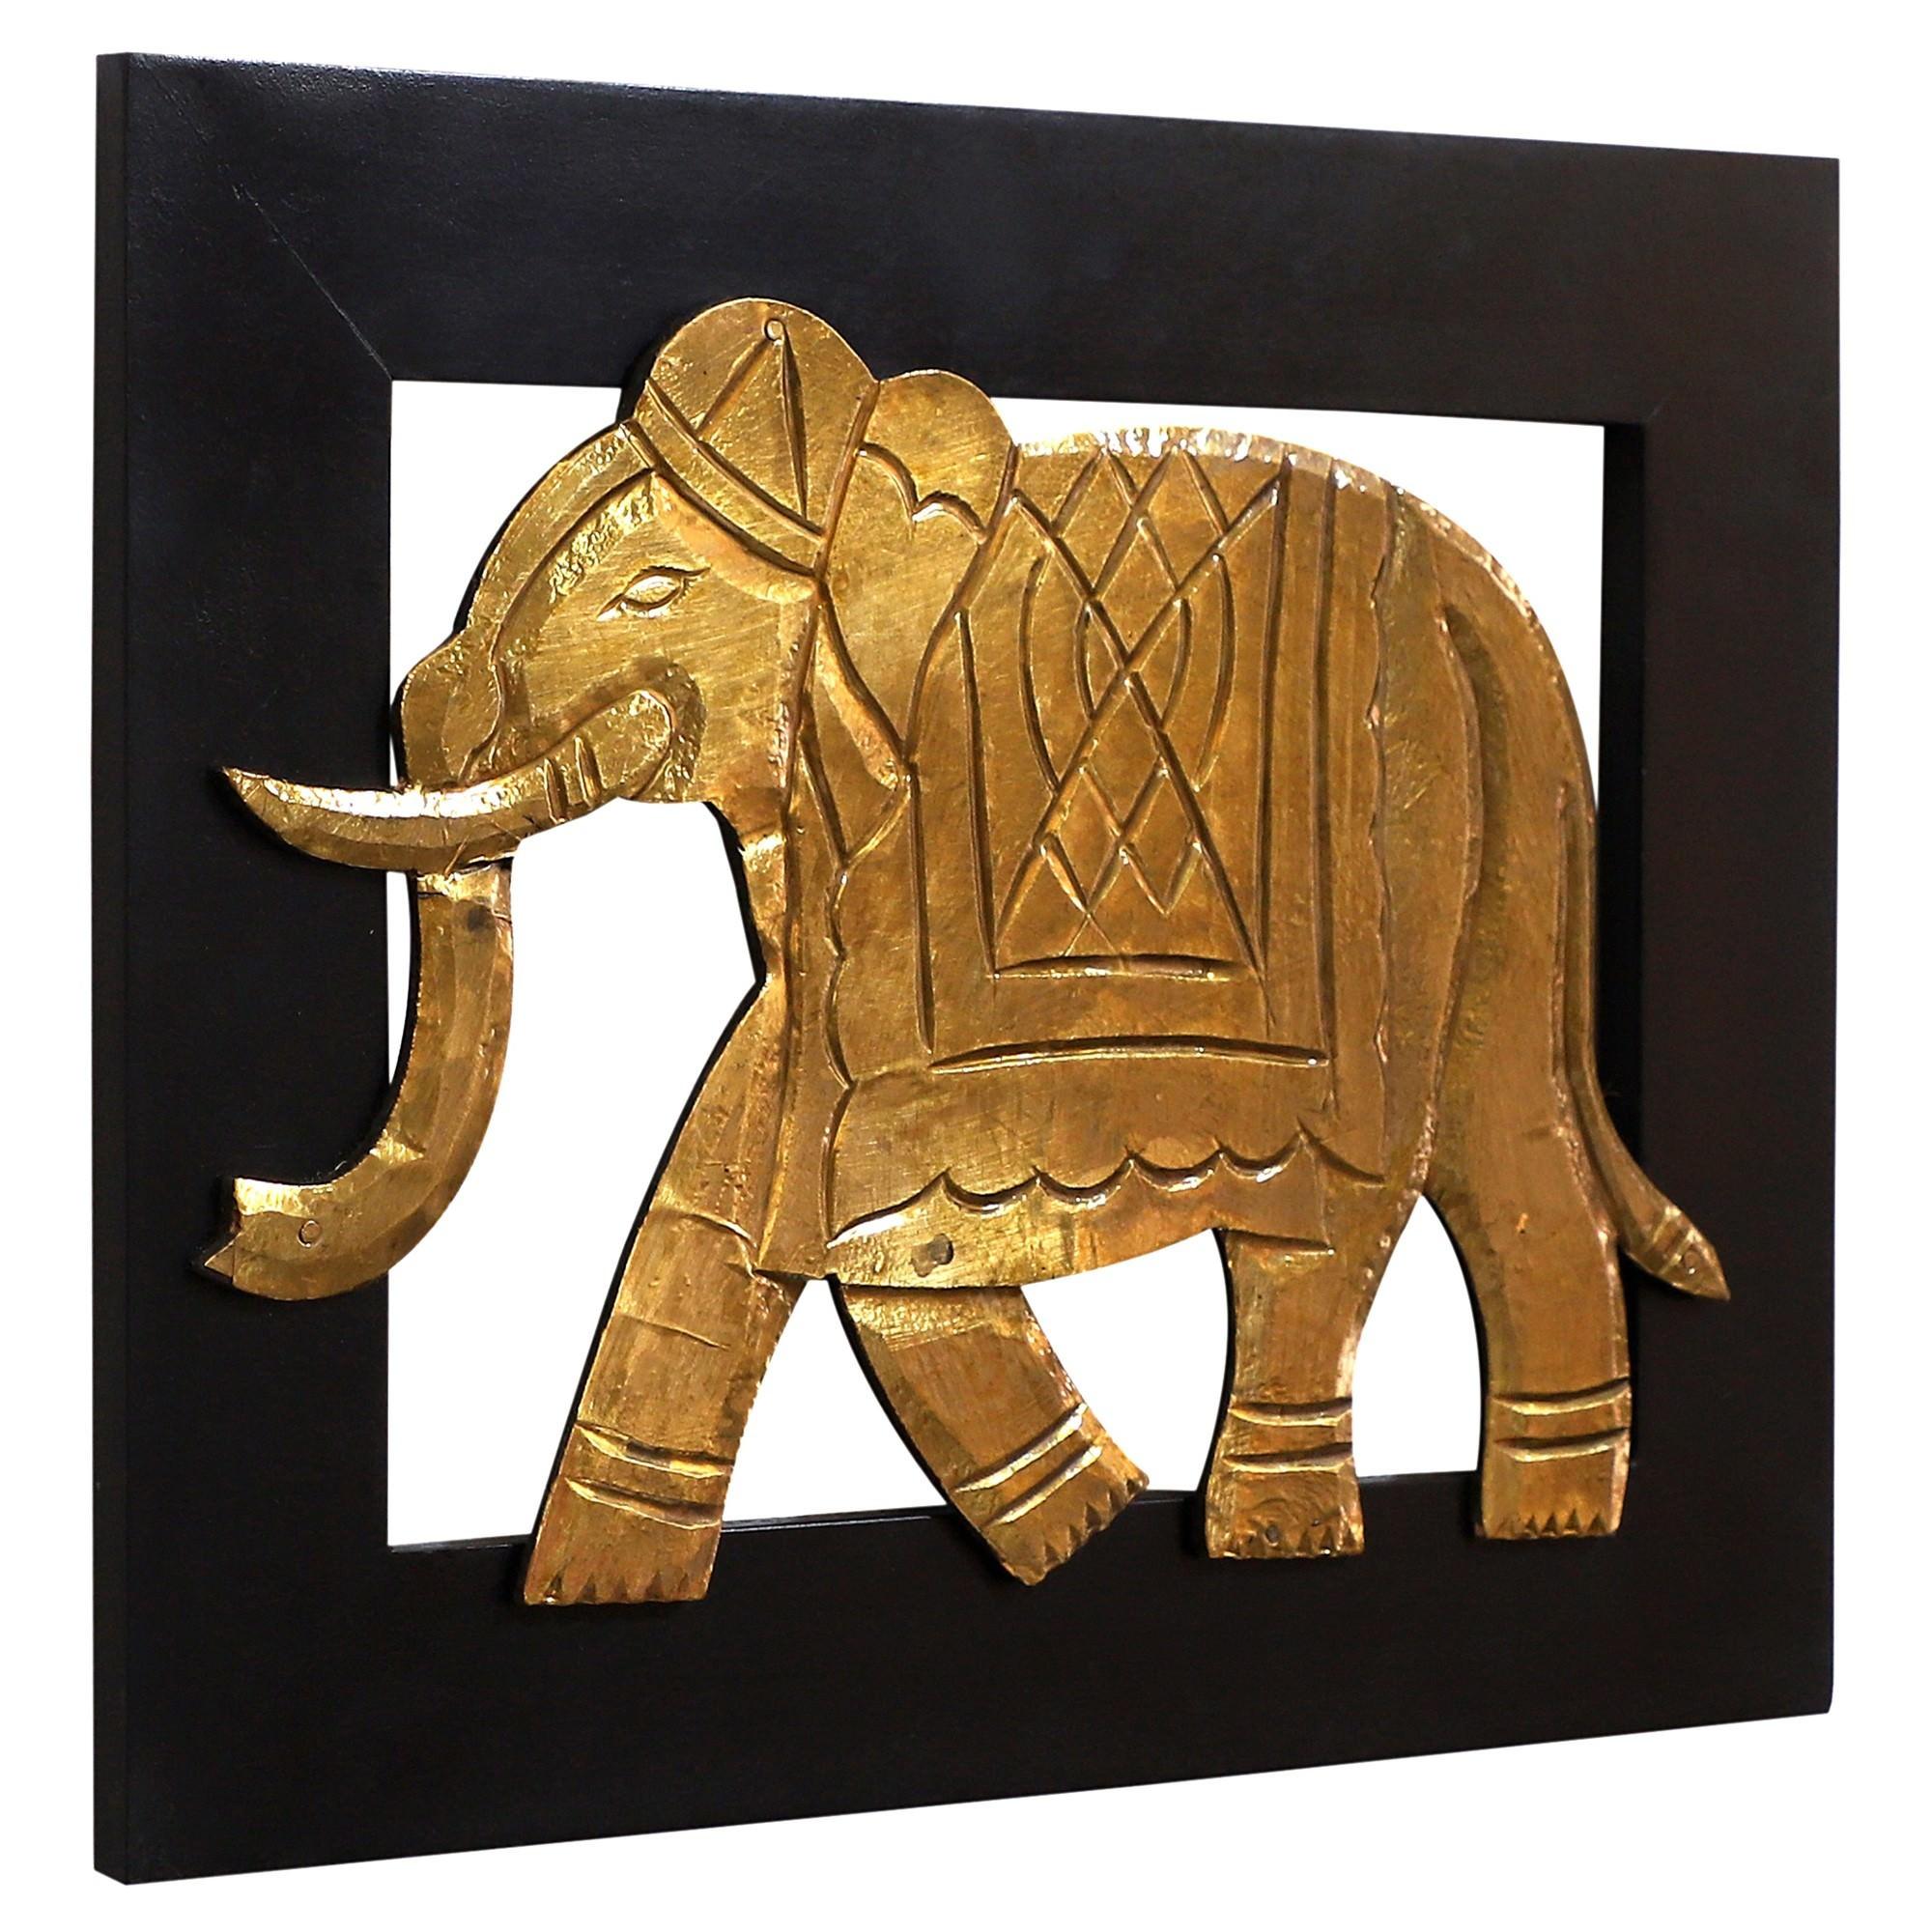 Maha Metal & Wood Wall Decor, Elephant, 33cm